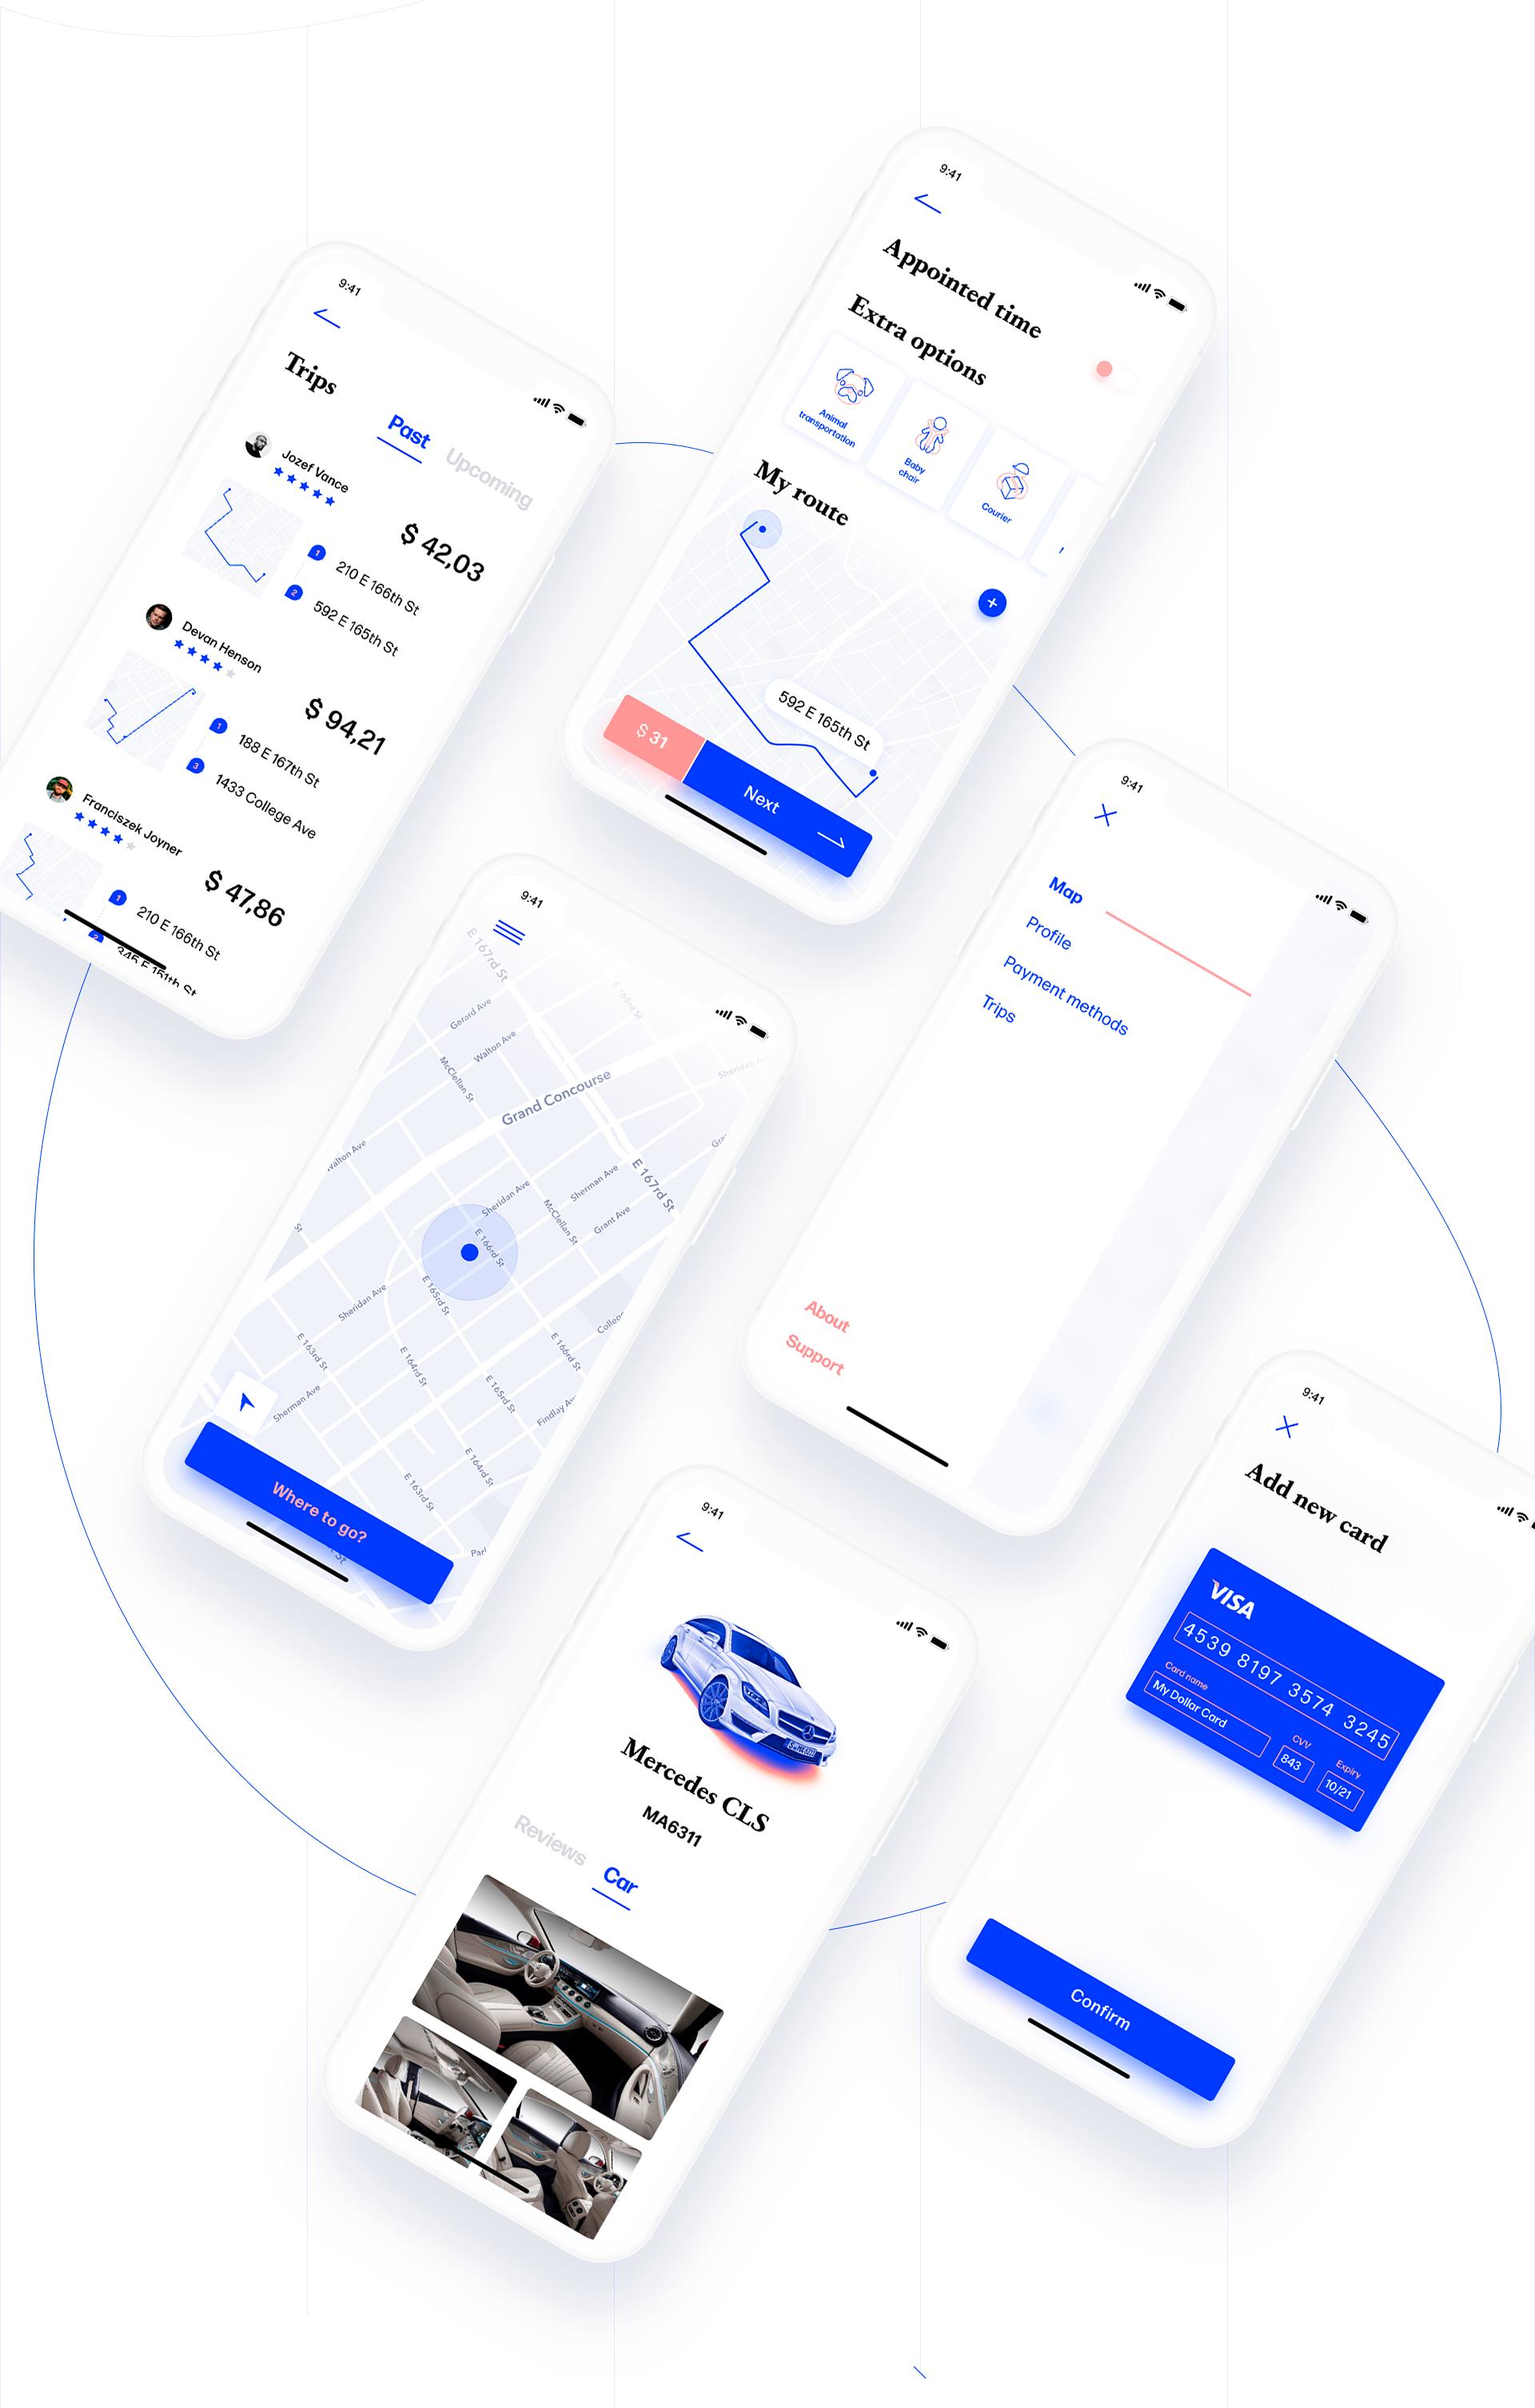 Mobile App Design: NYC Taxi App Concept using Adobe XD